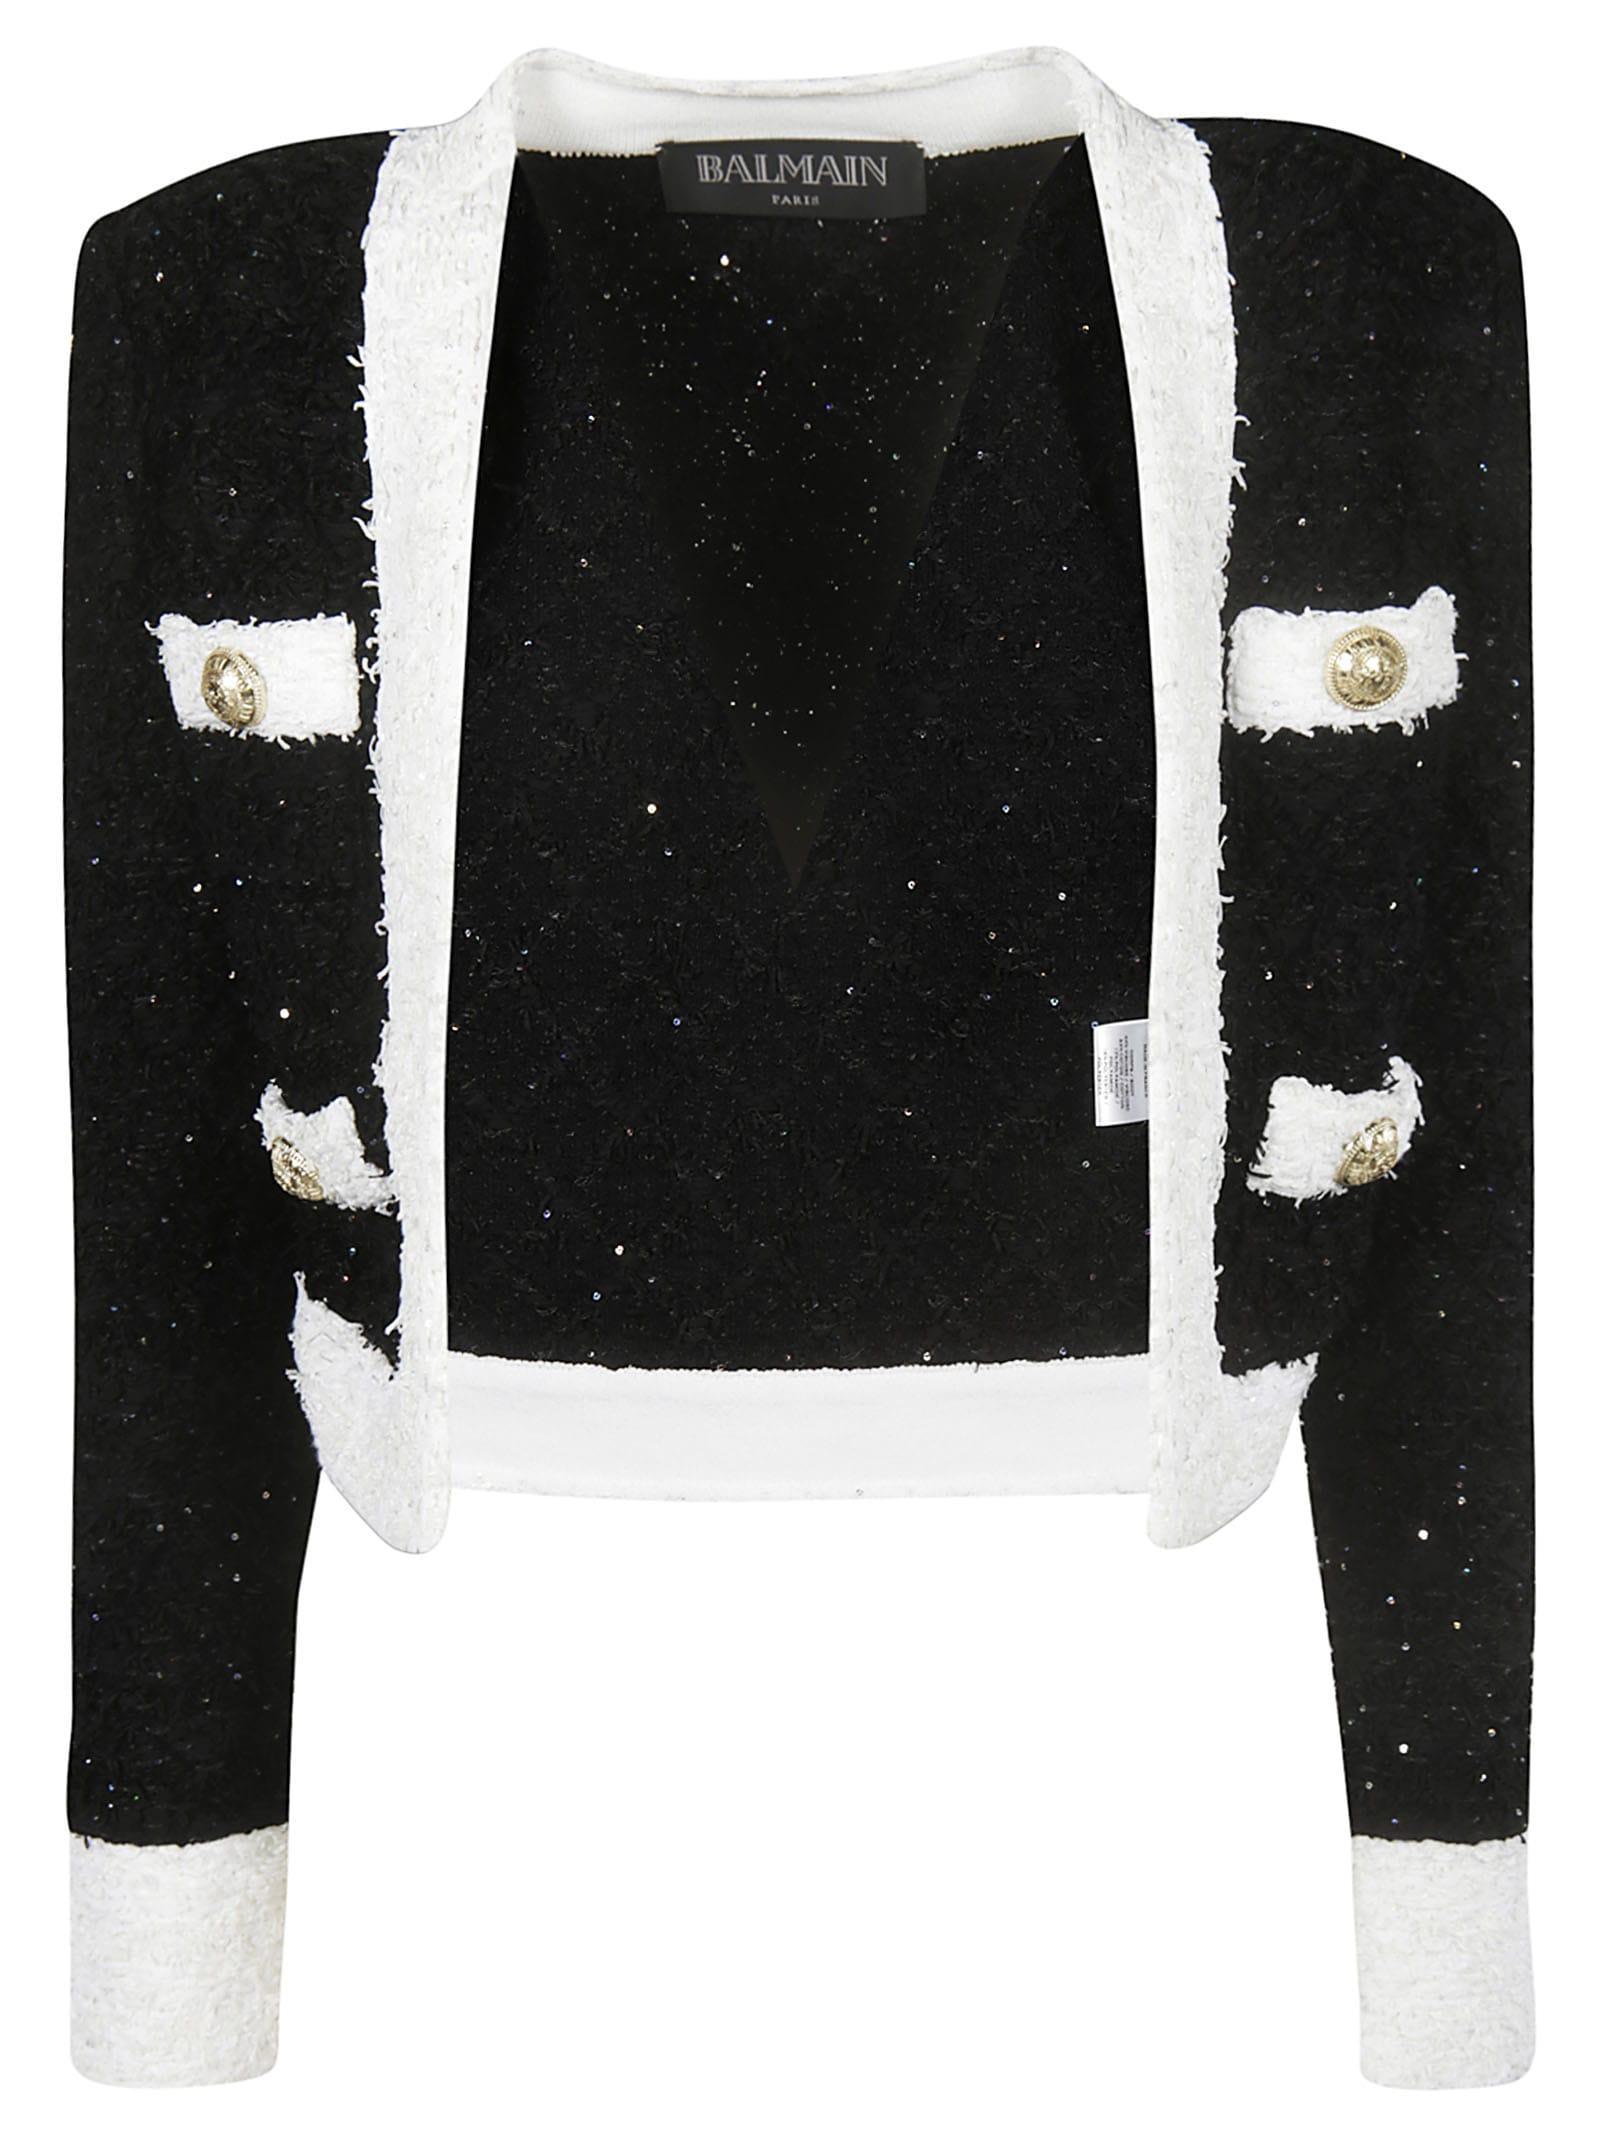 Balmain Cropped Jacket